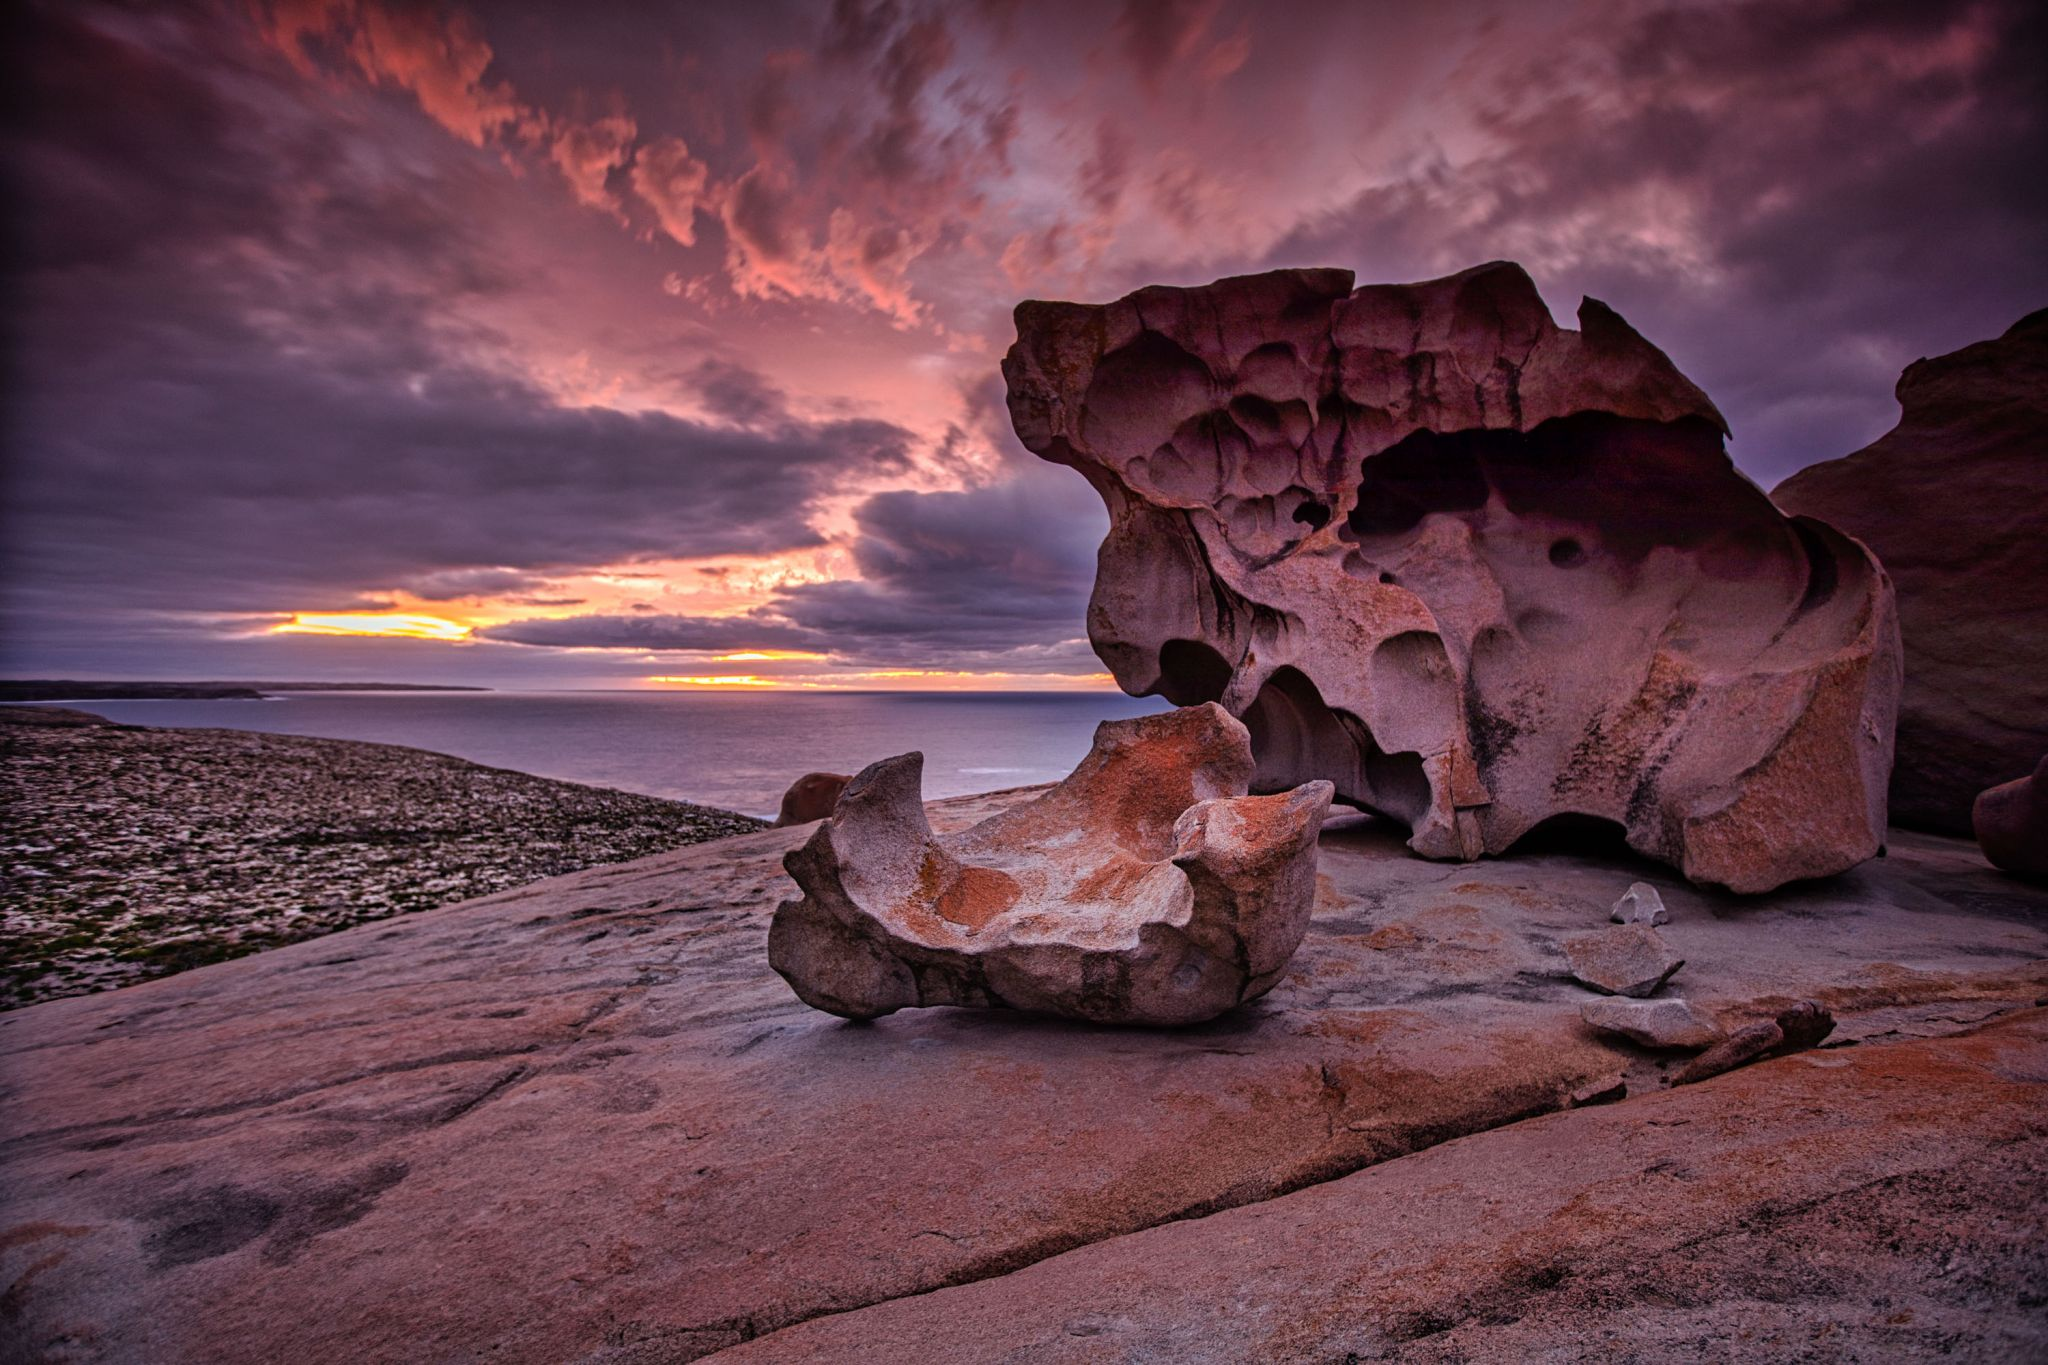 Remarkable Rocks, sunrise, 'Dogs Nose' Kangaroo Island, SA, Australia